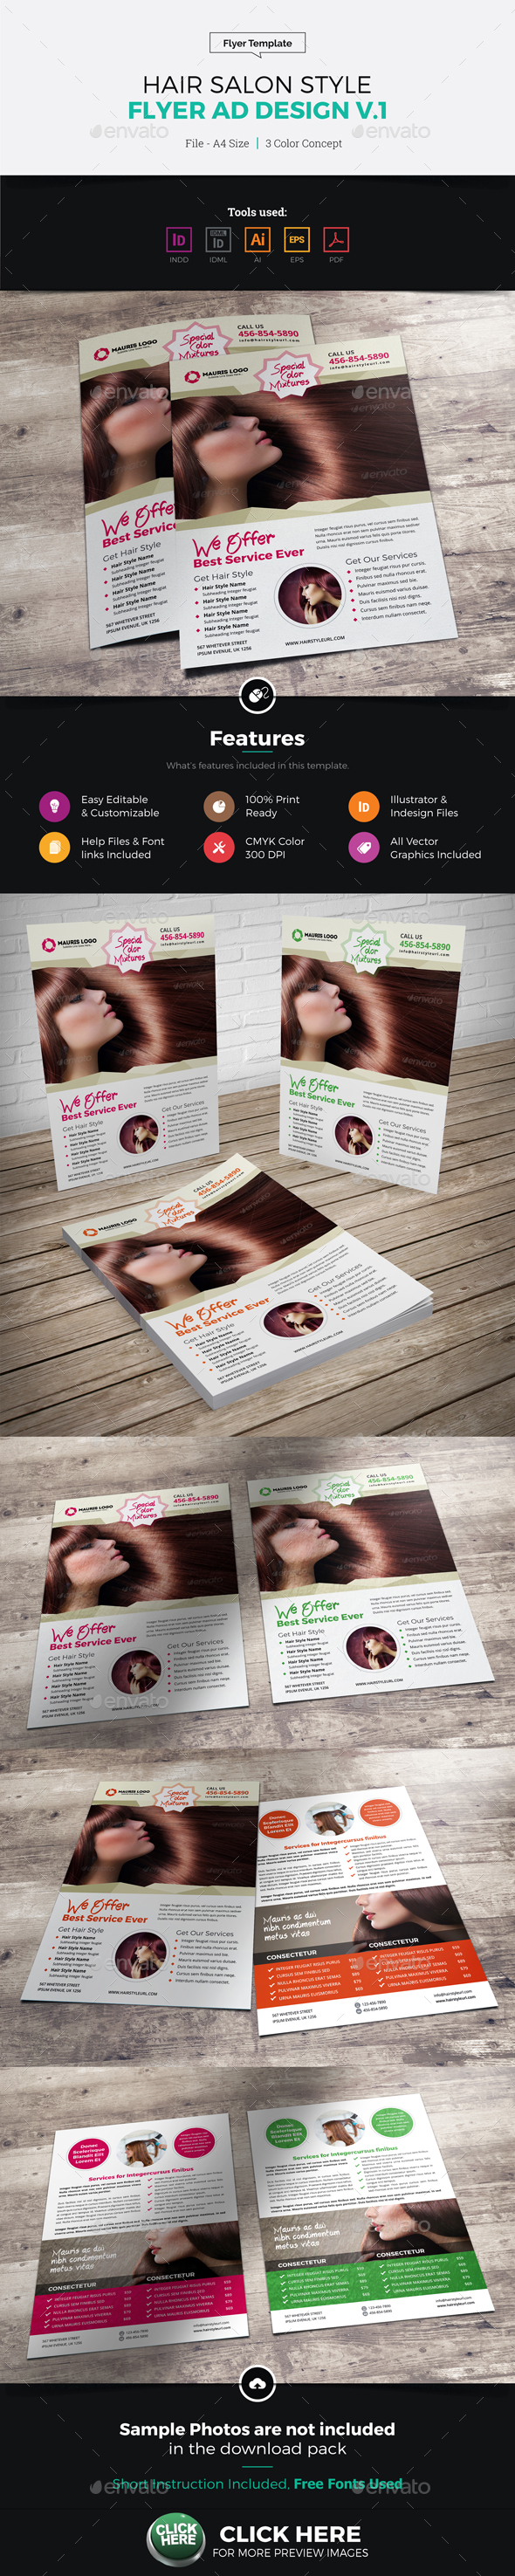 Hair Salon Style Flyer Design - Corporate Flyers